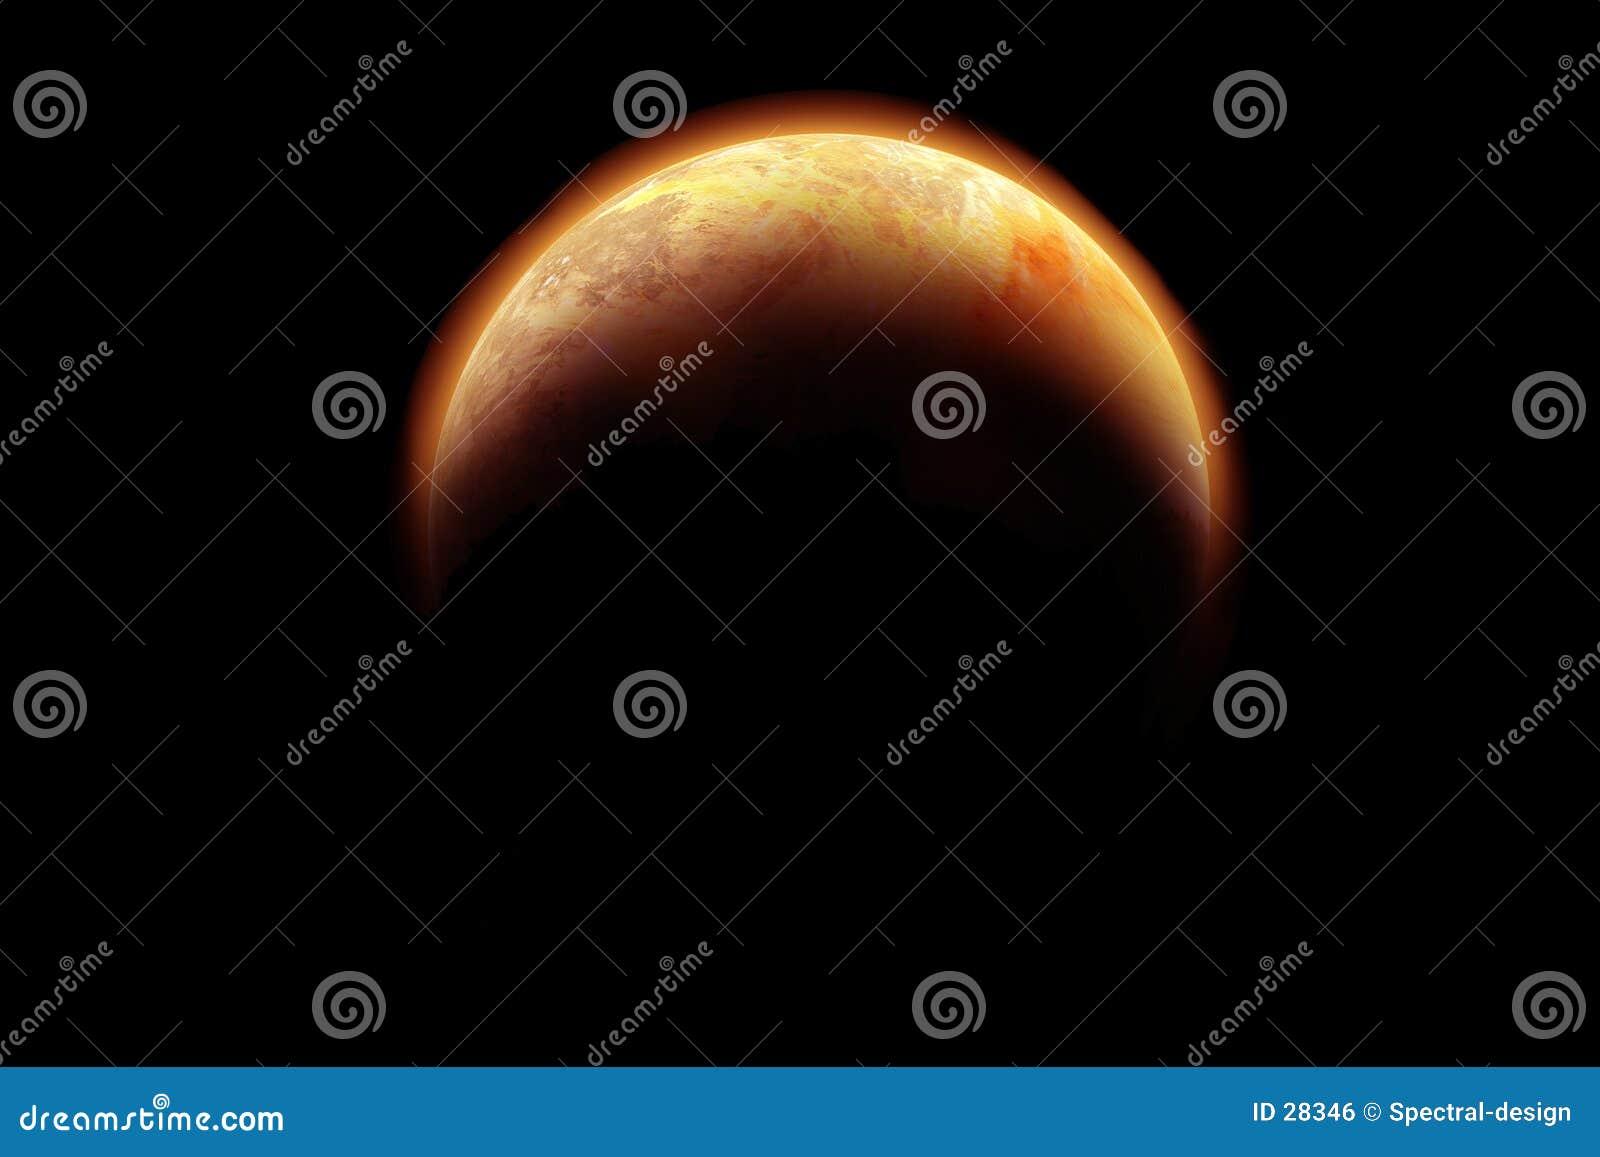 Planet resource 2